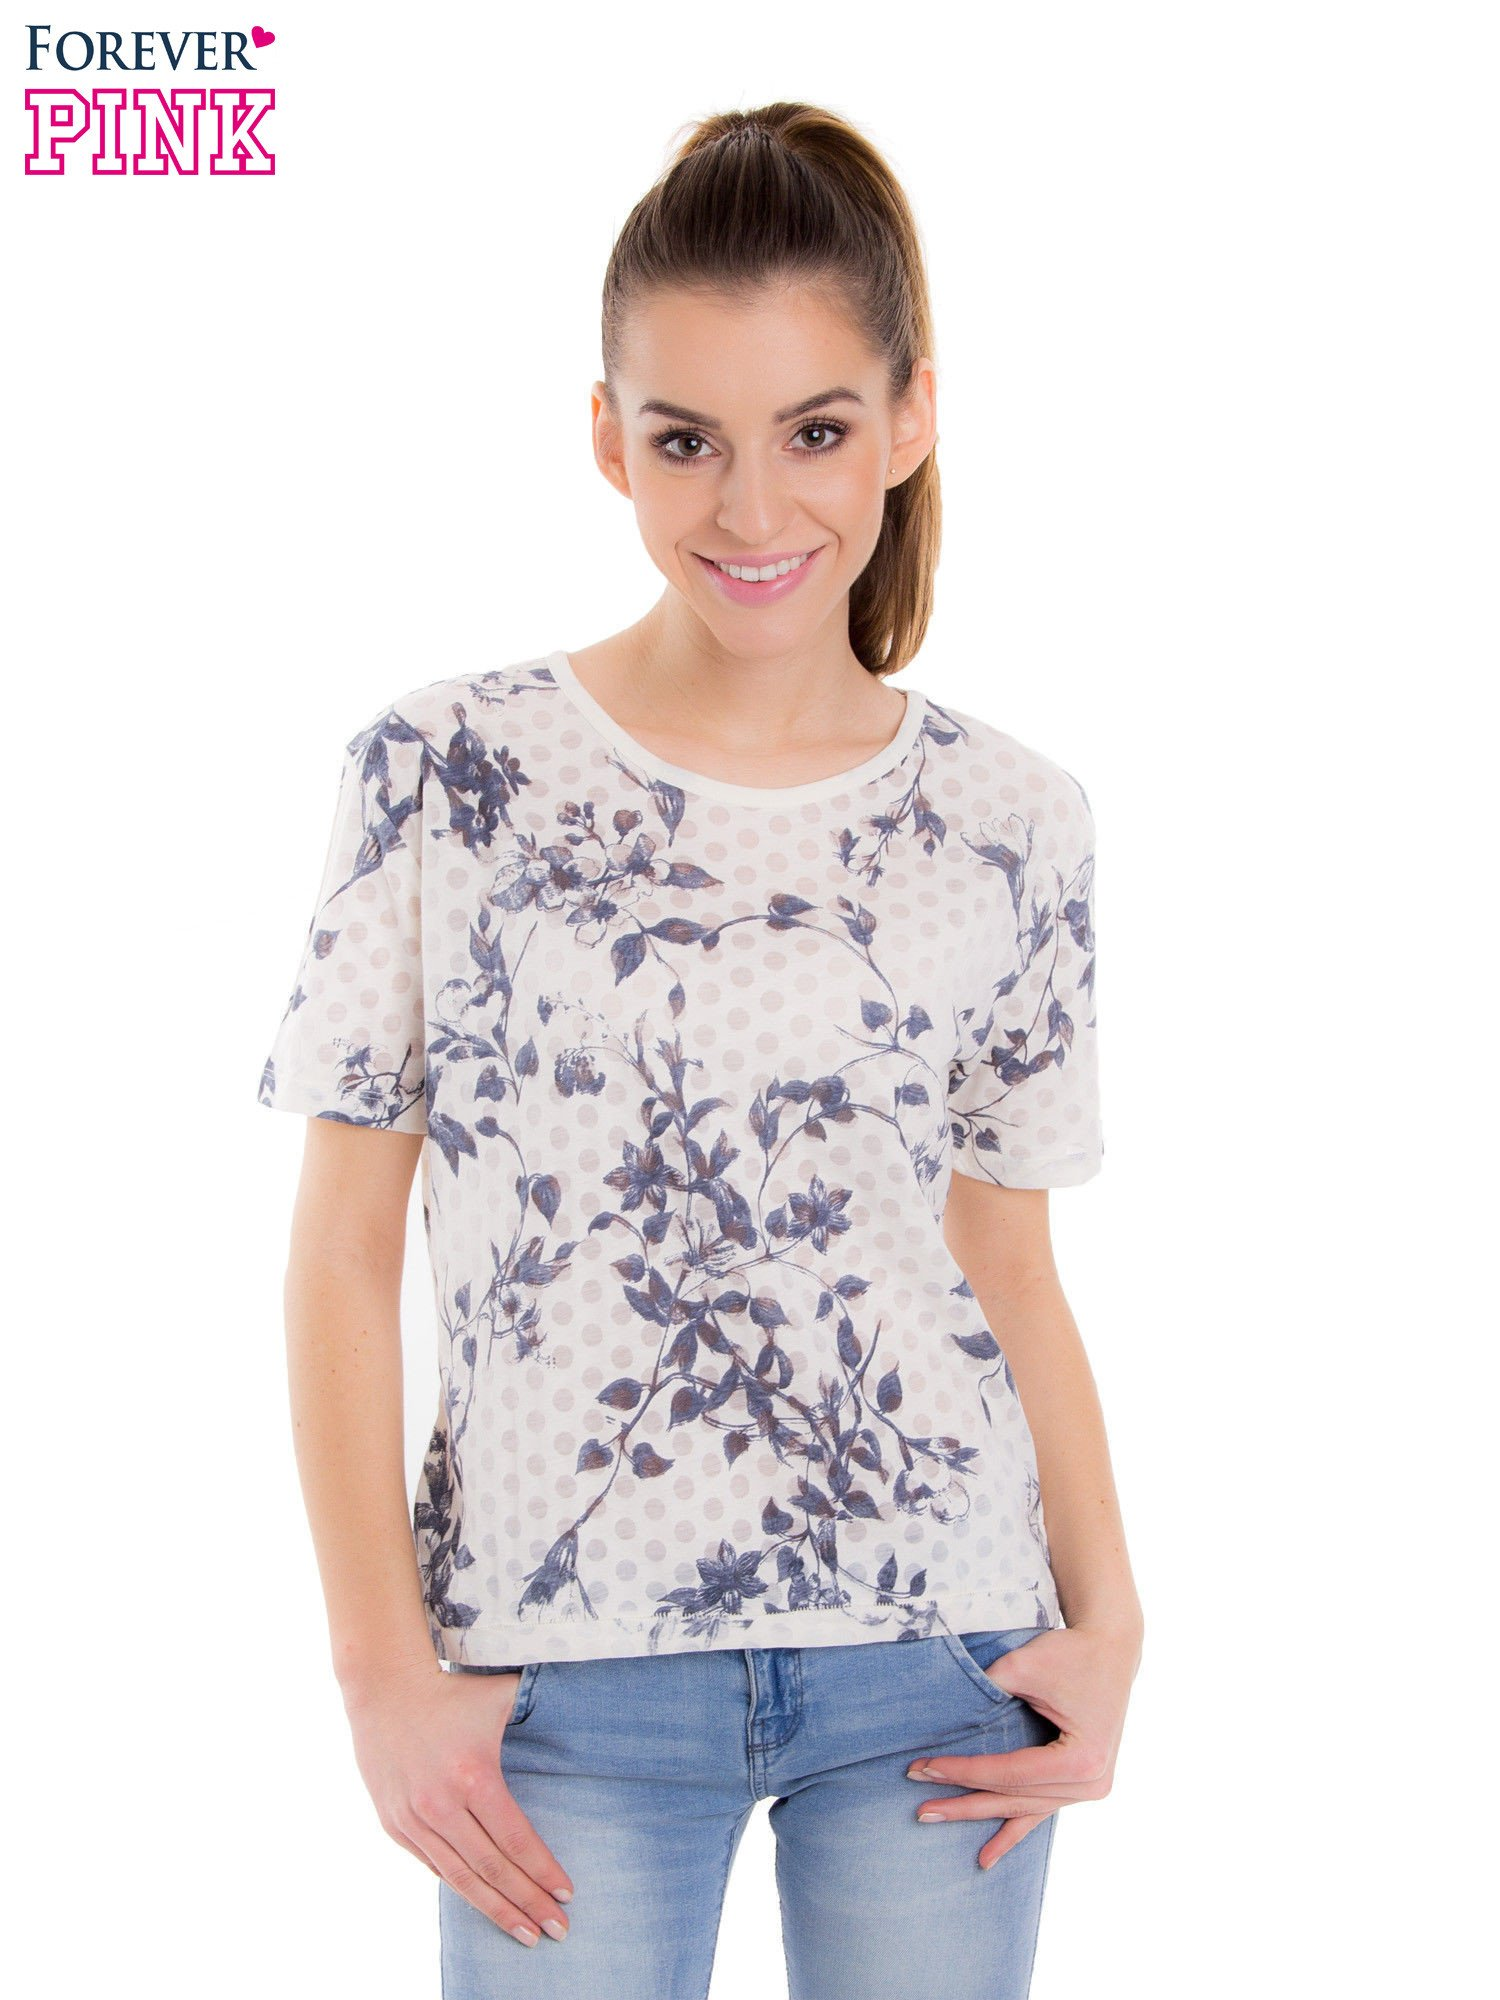 Biały t-shirt z all over floral printem                                  zdj.                                  1